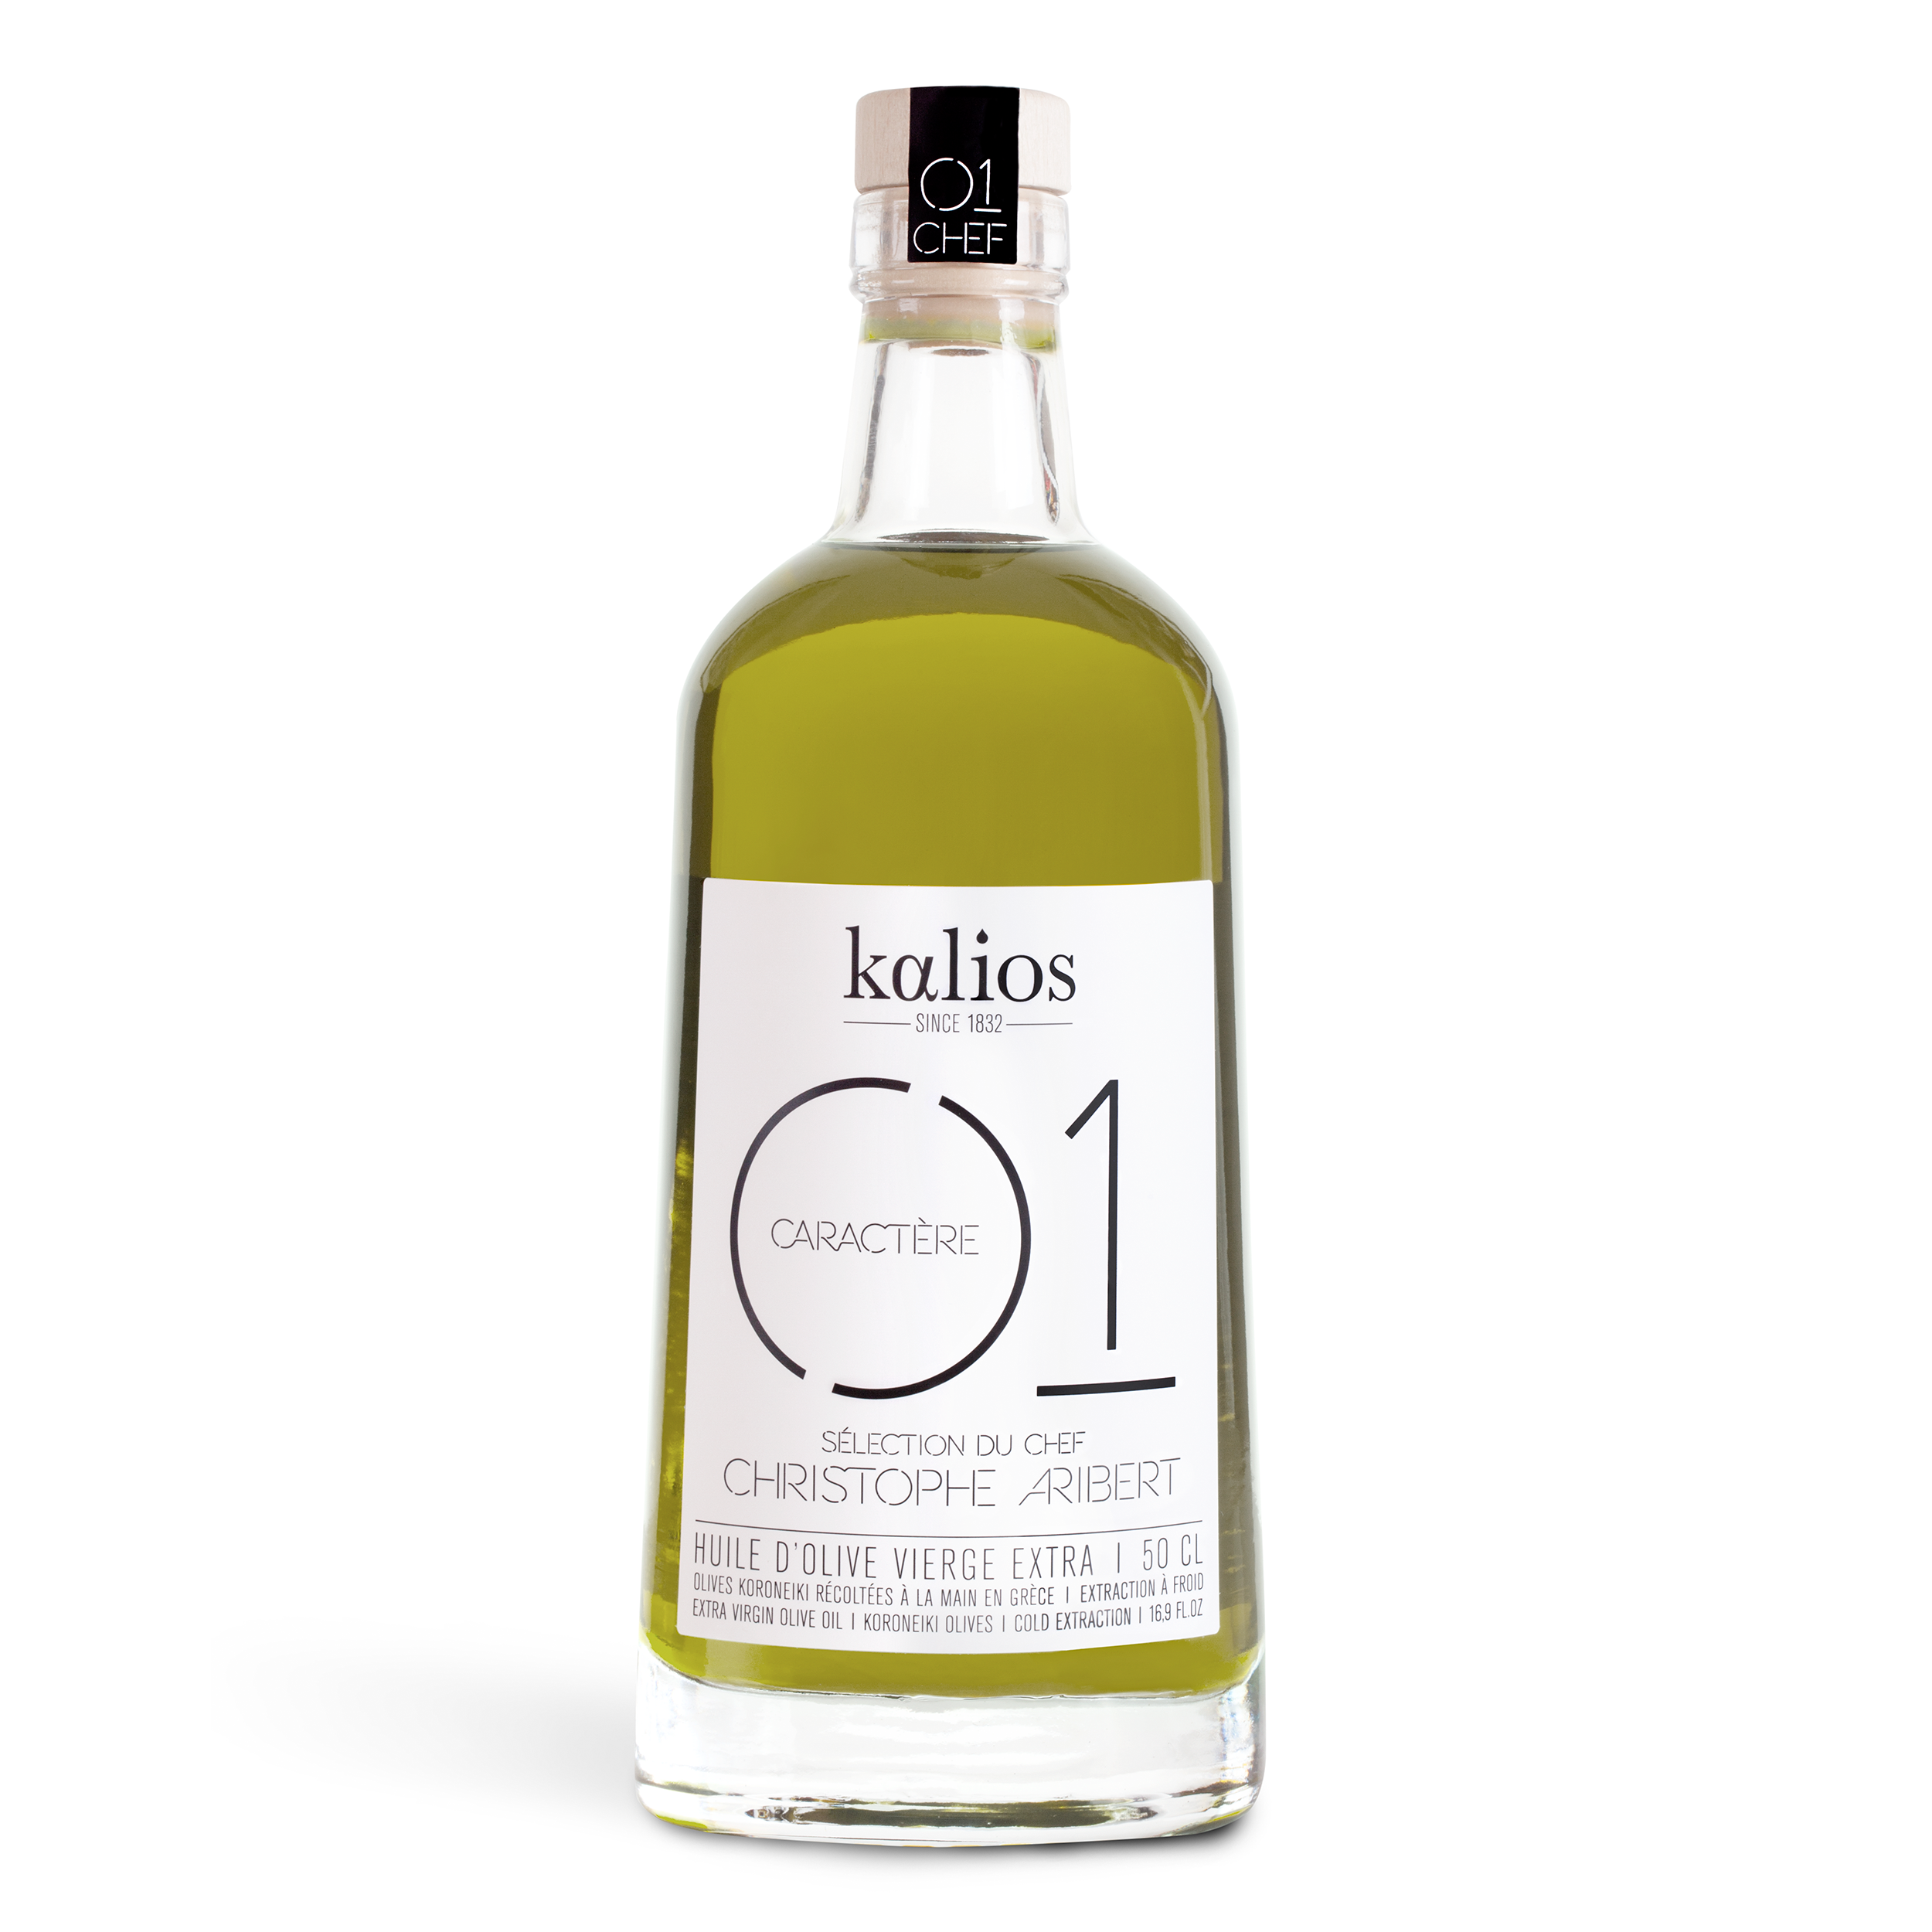 Huile d'olive 01 Caractère Chef Christophe Aribert, Kalios (500 ml)